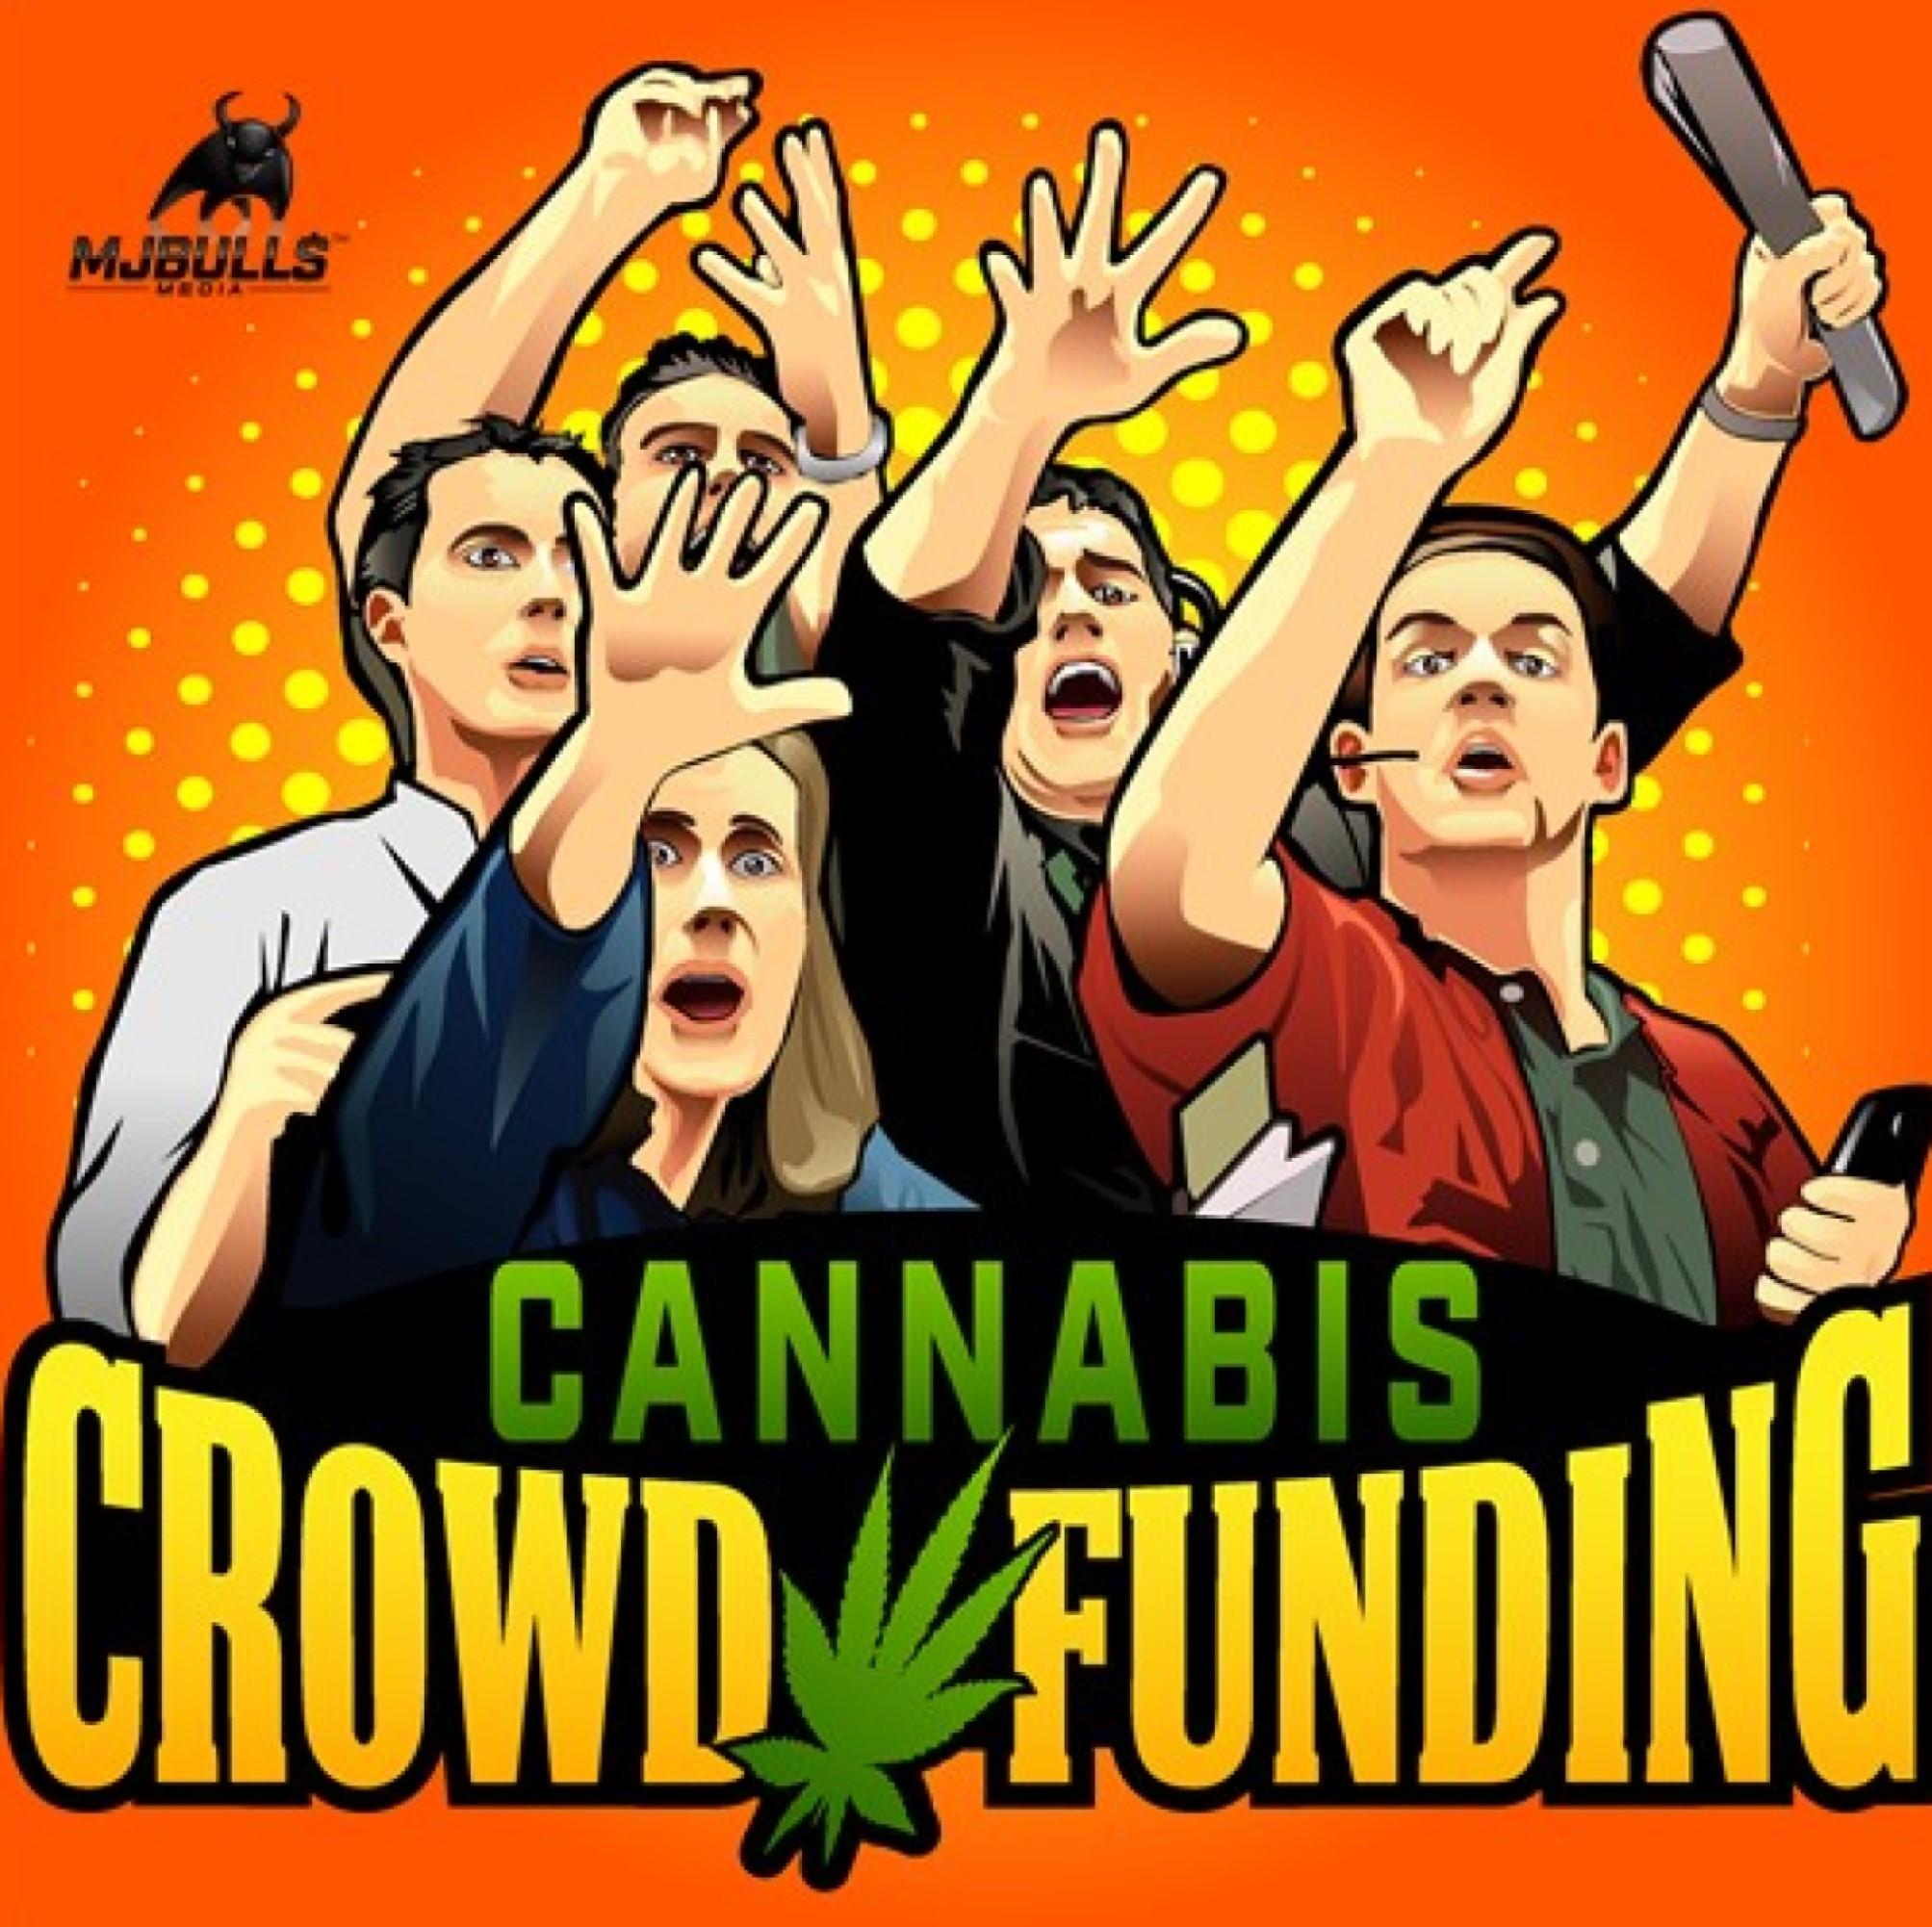 cannabis crowdfunding artwork with black bull square.jpg